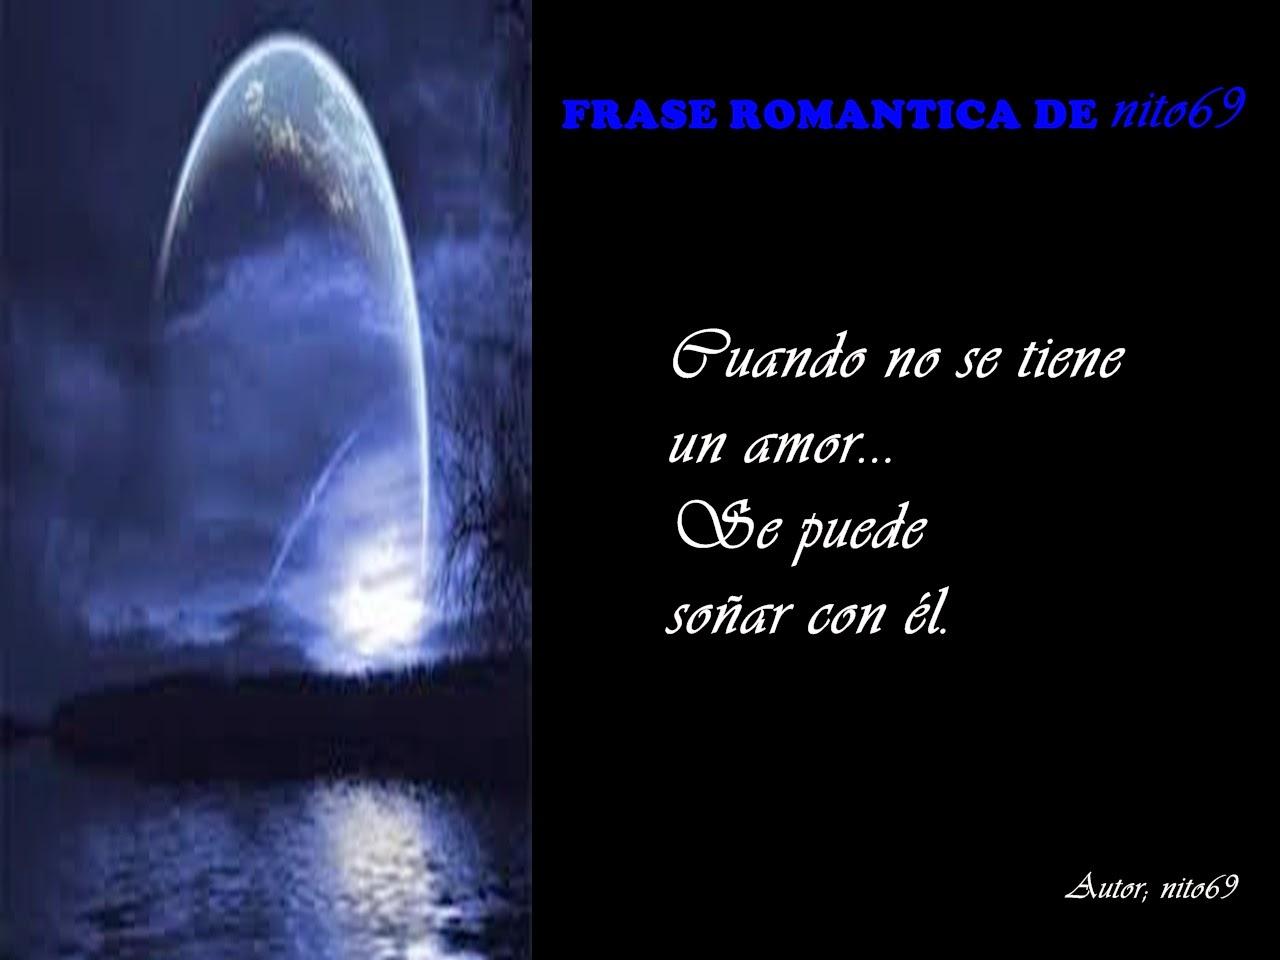 FRASE ROMANTICA DE nito69